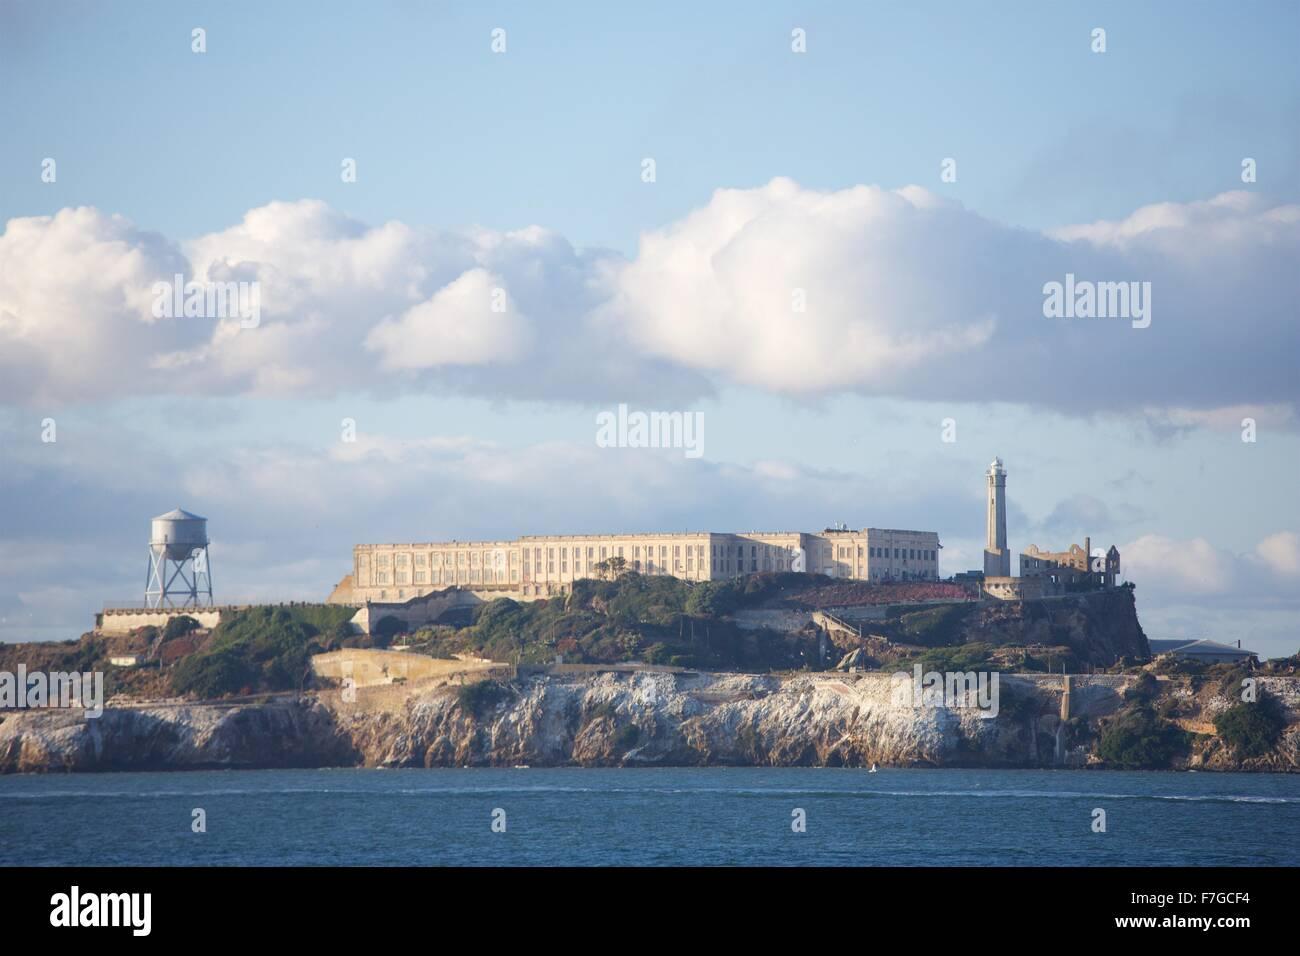 Alcatraz in late afternoon sunshine, San Francisco, California - Stock Image